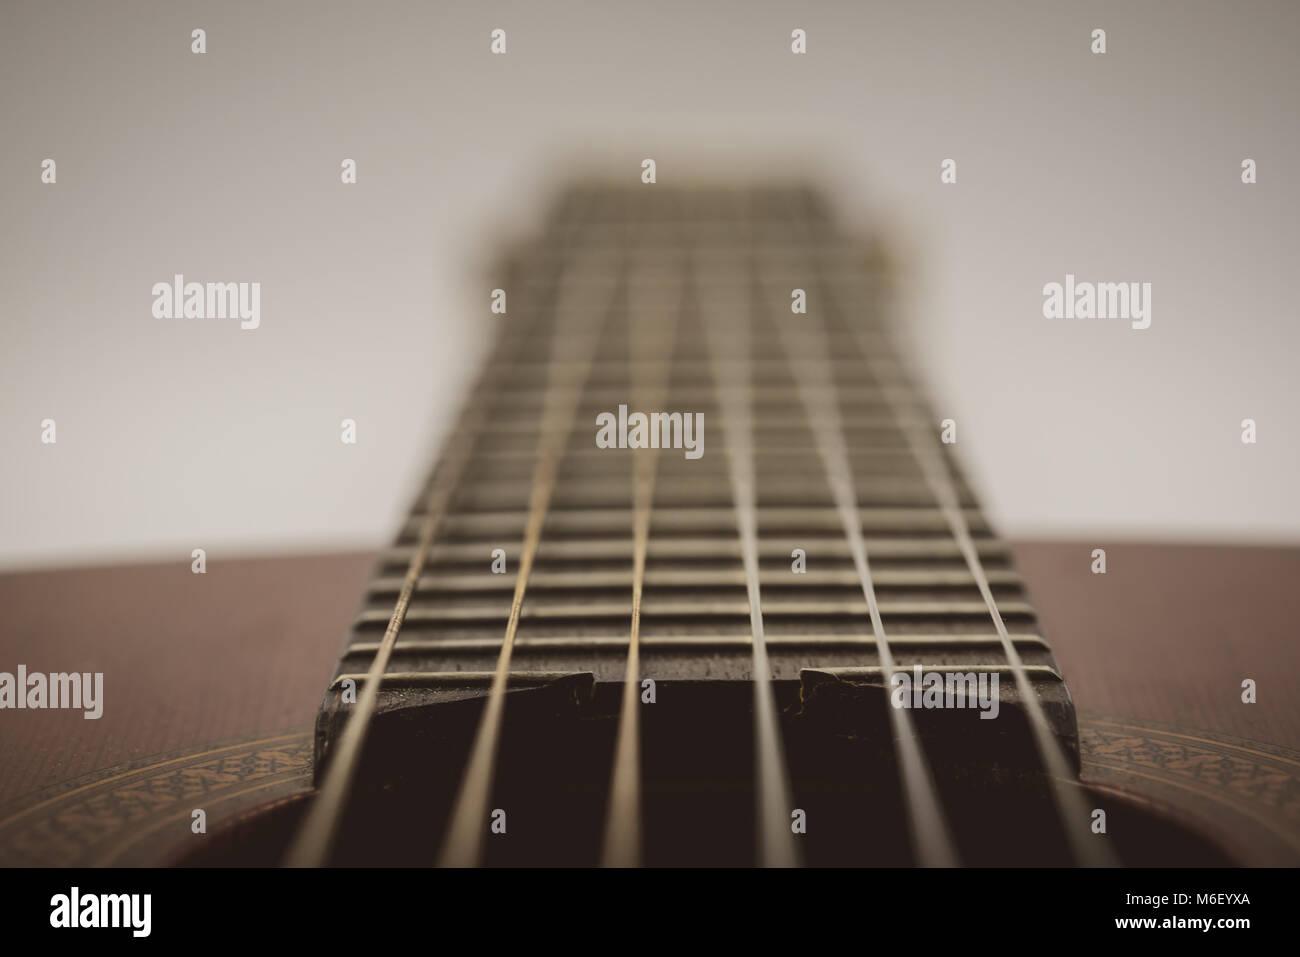 Nylon & steel strung spanish guitar isolated on white background - Stock Image